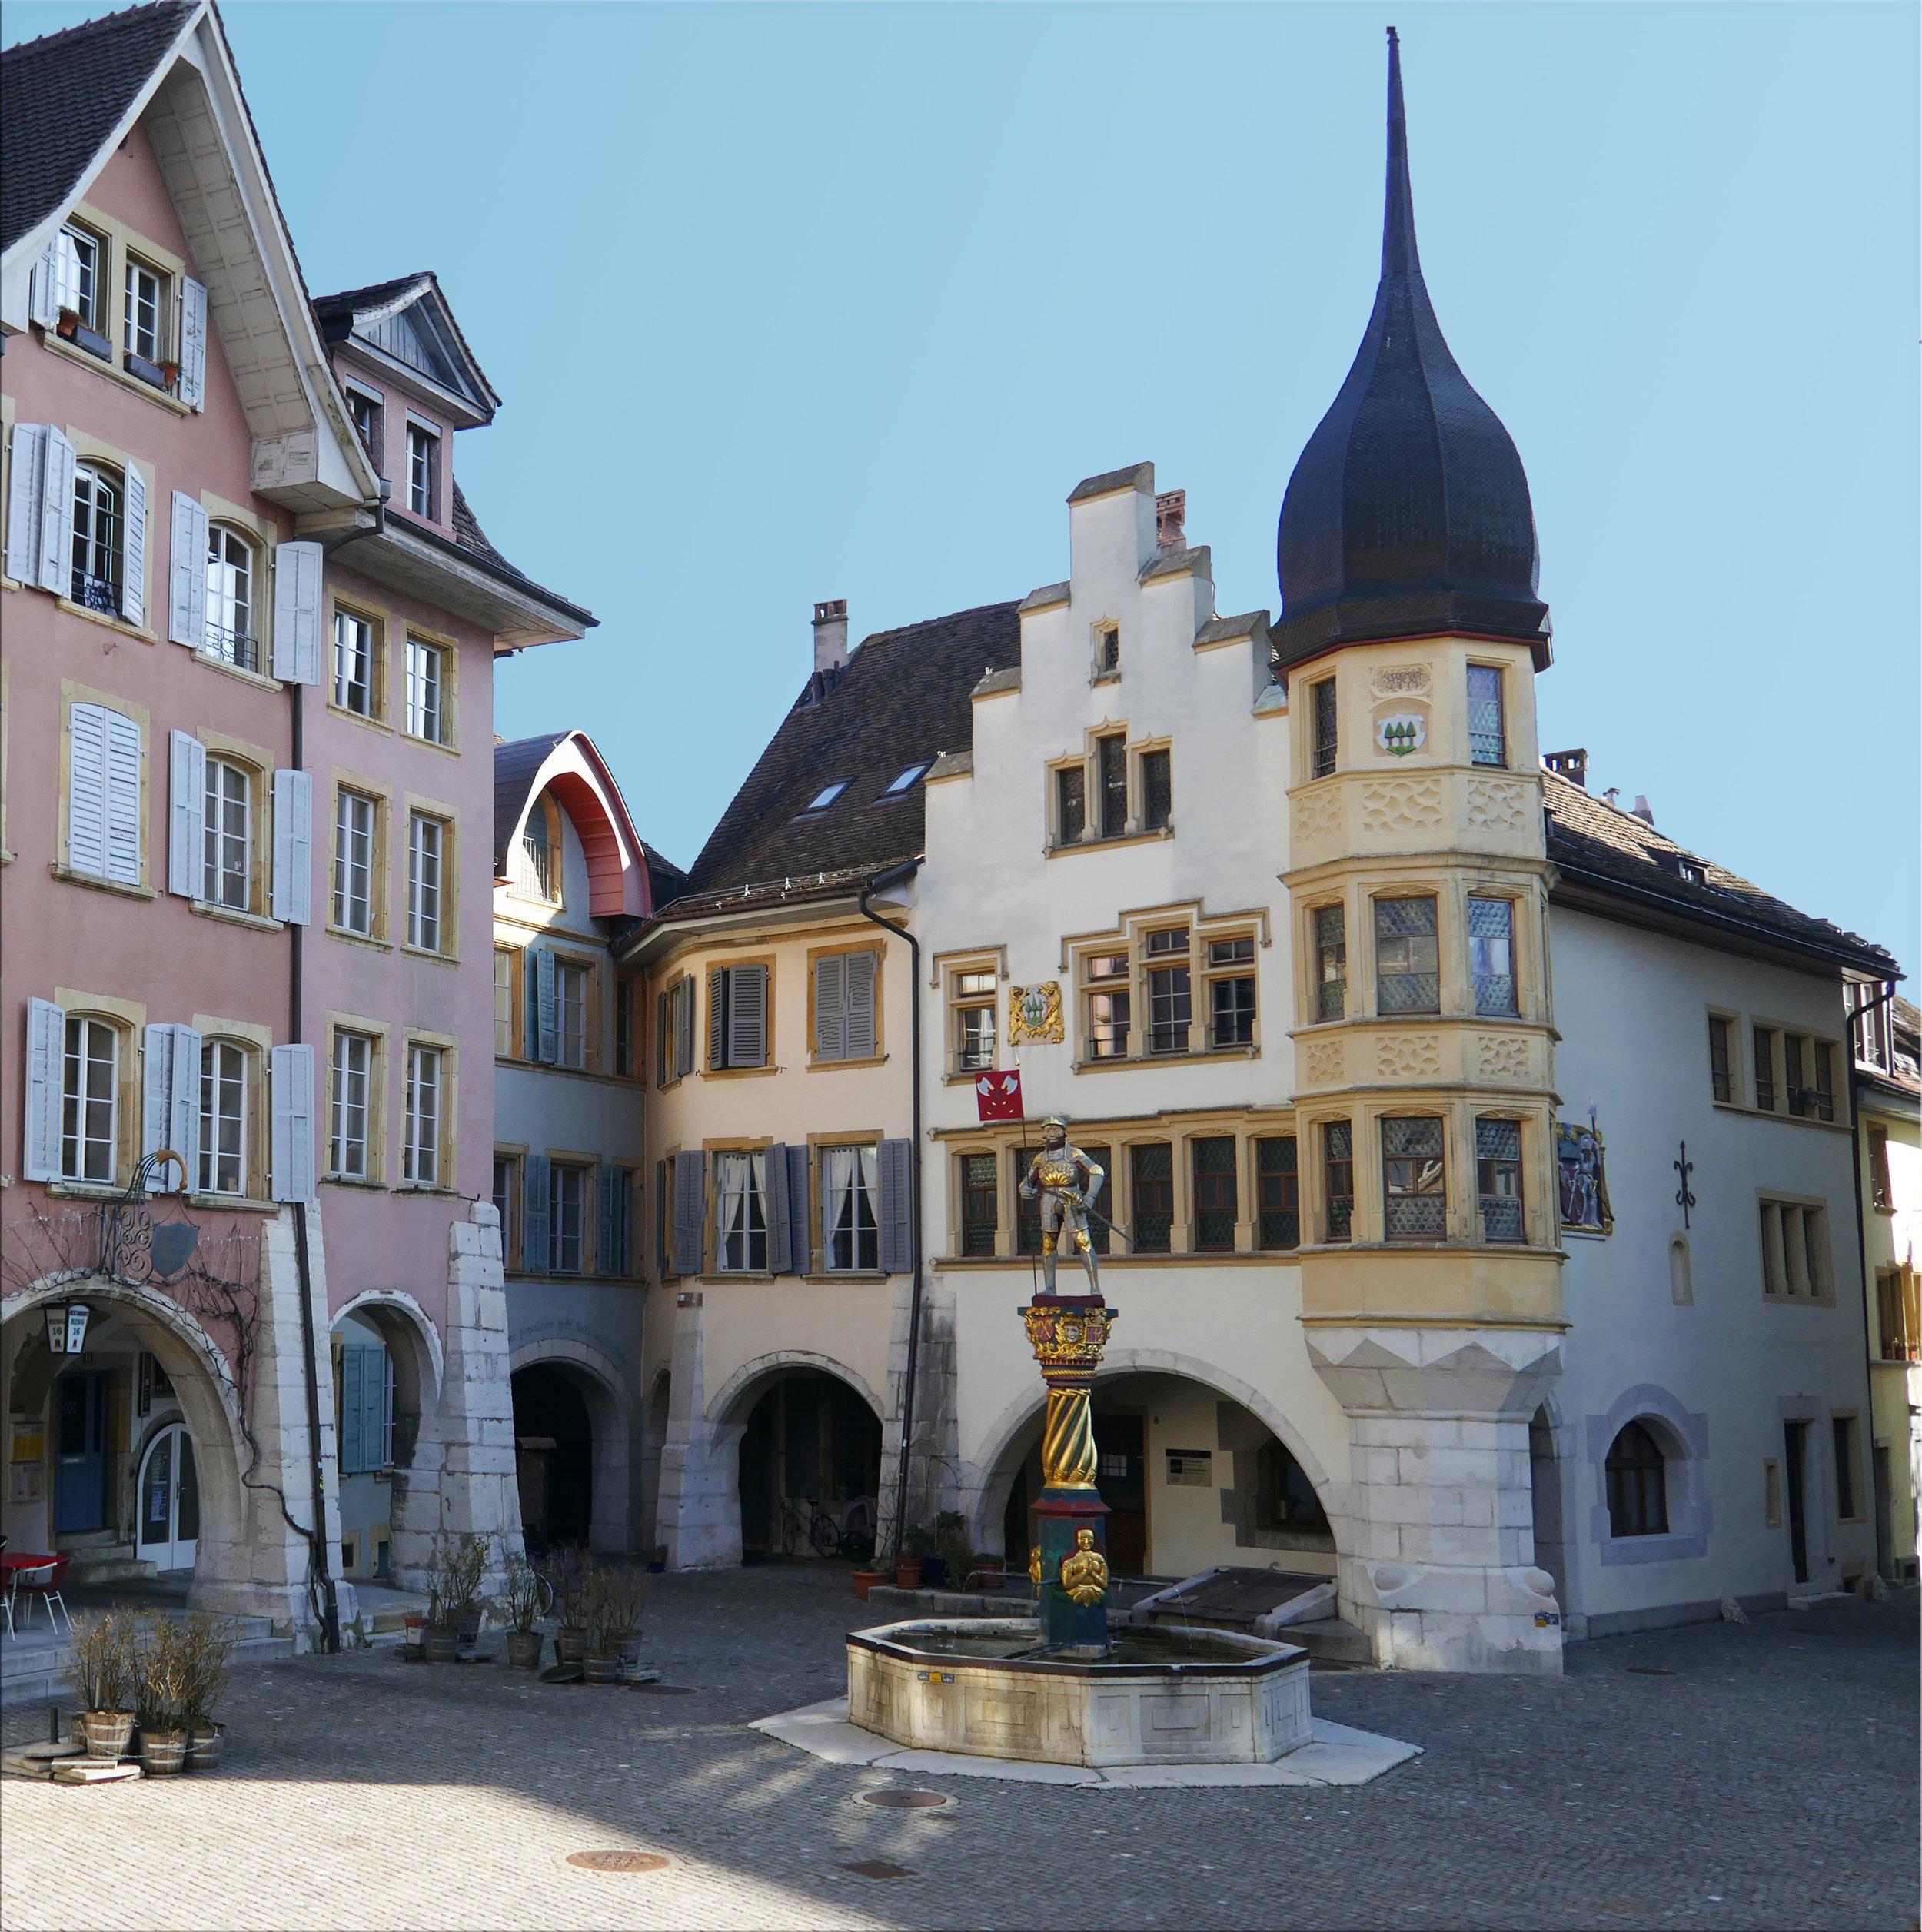 The town of Biel/Bienne, home of Kennsen.